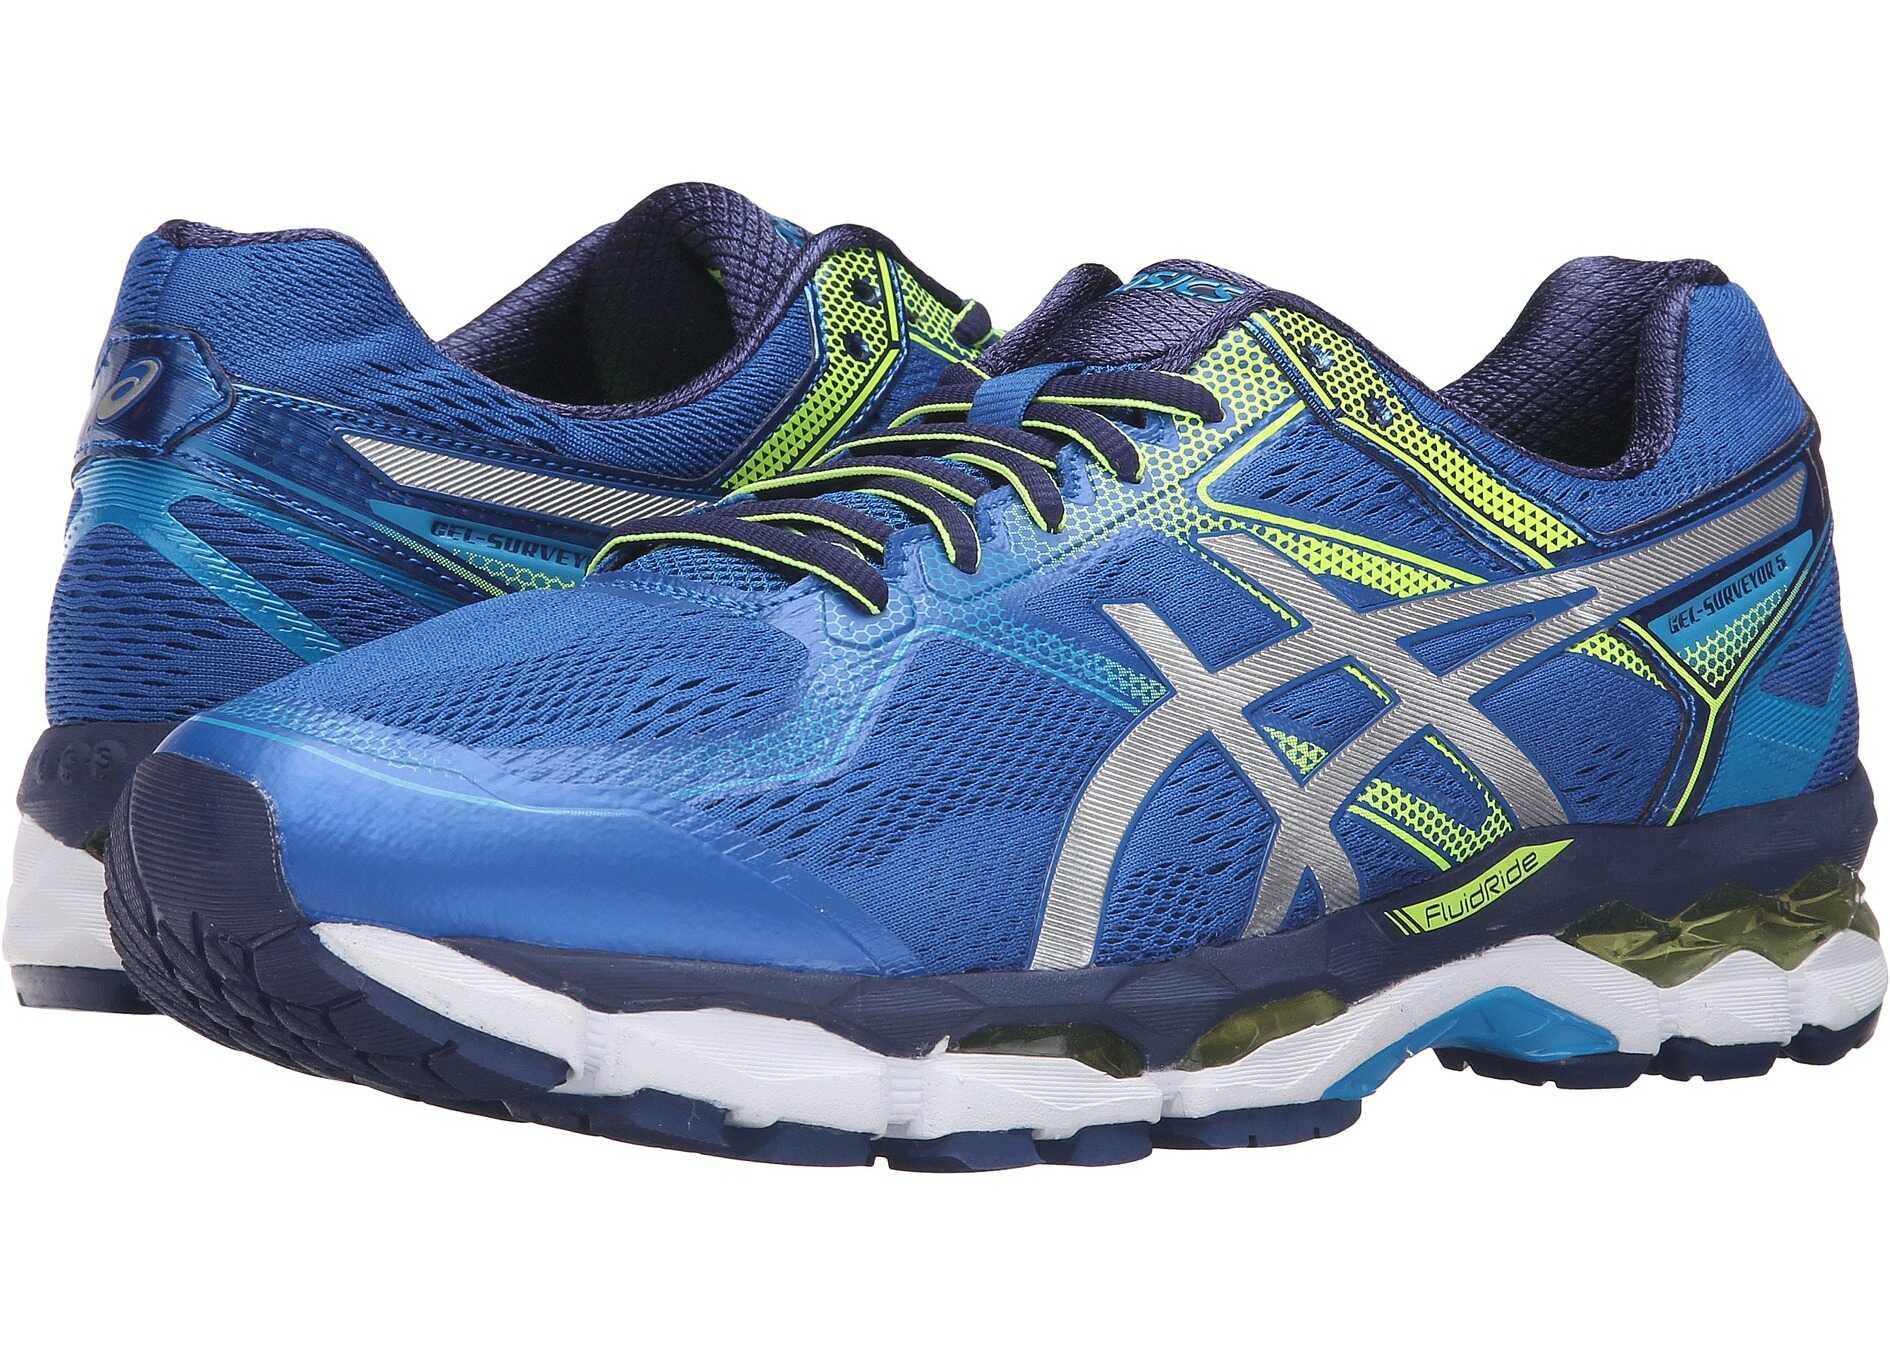 Pantofi Sport Barbati Asics Gel-surveyor® 5 Imper